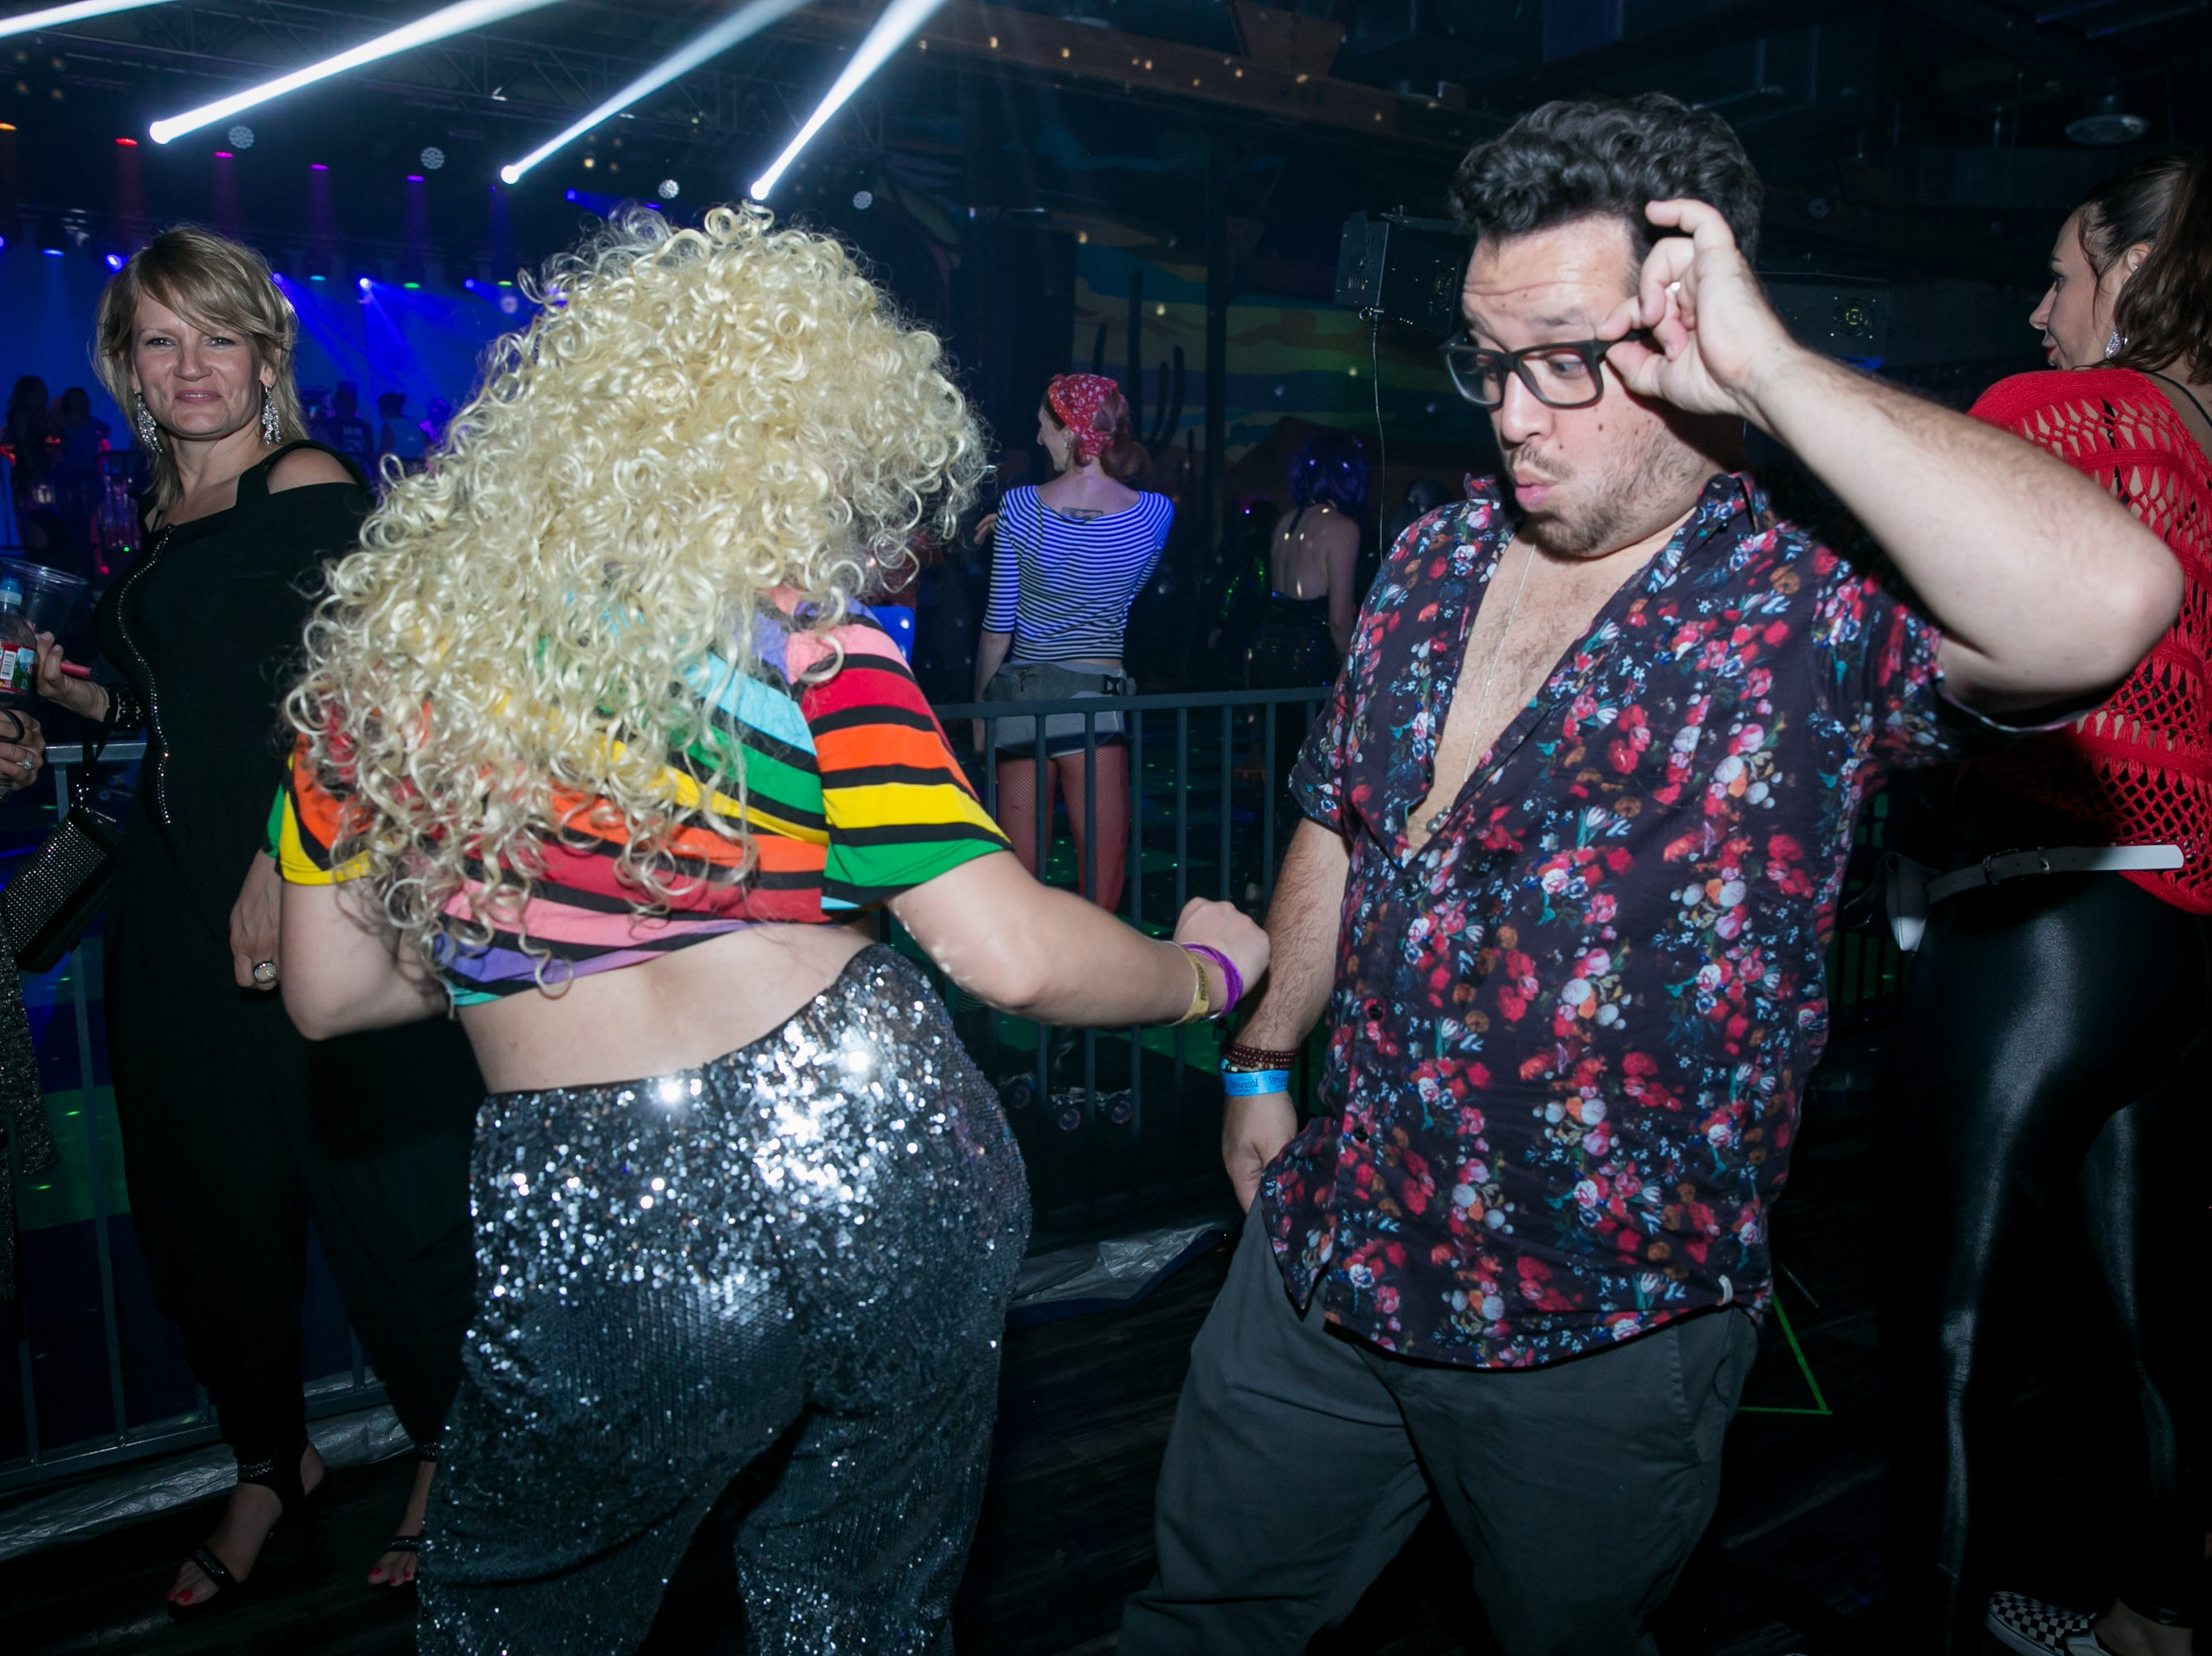 Groove thangs were shook during The Van Buren's Roller Disco Dance Party on Friday, September 21, 2018.